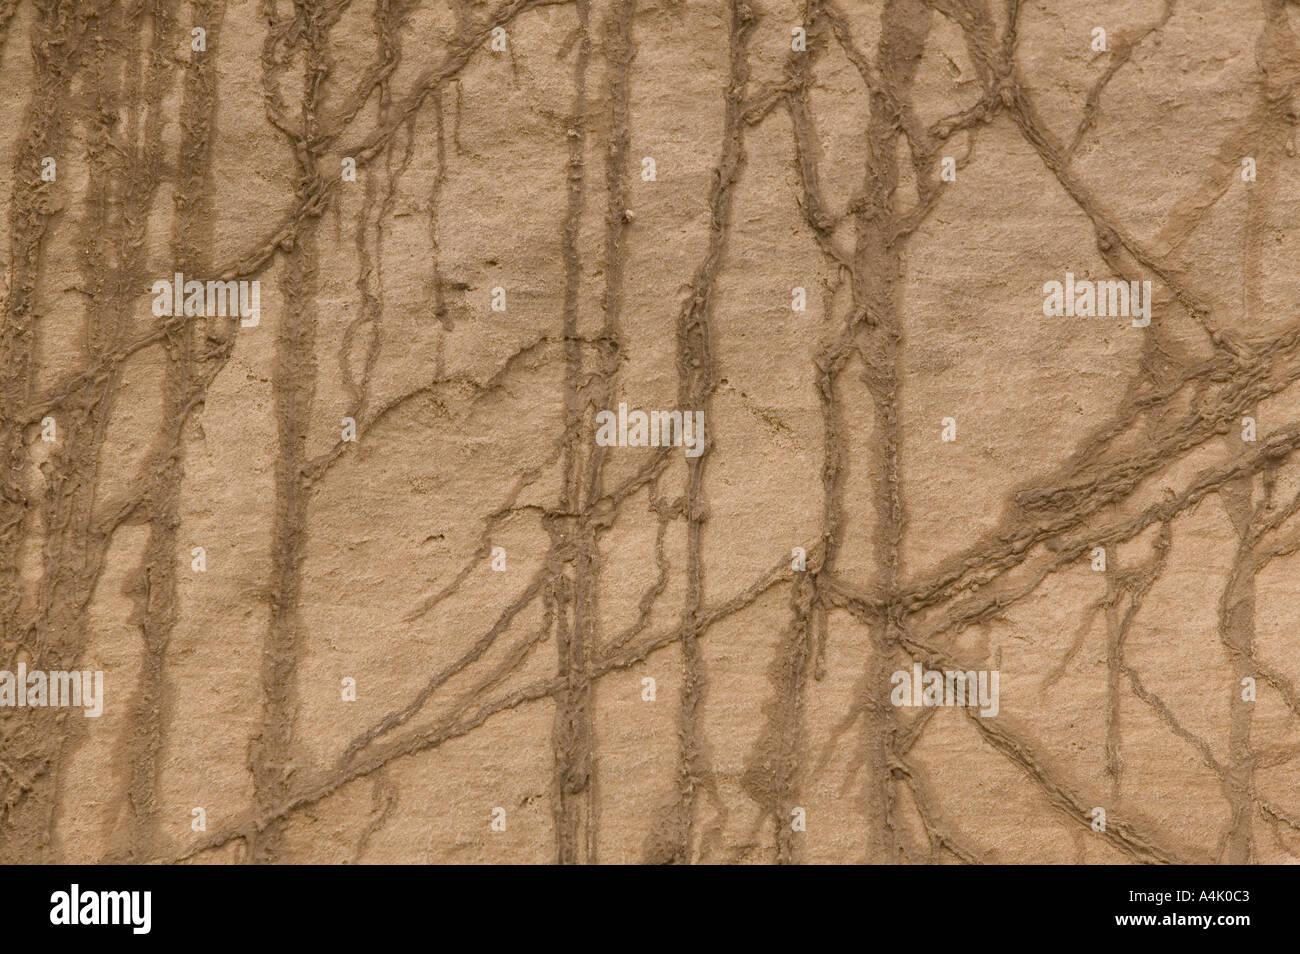 pattersn caused by seepage on coastal cliffs at cromer Norfolk - Stock Image